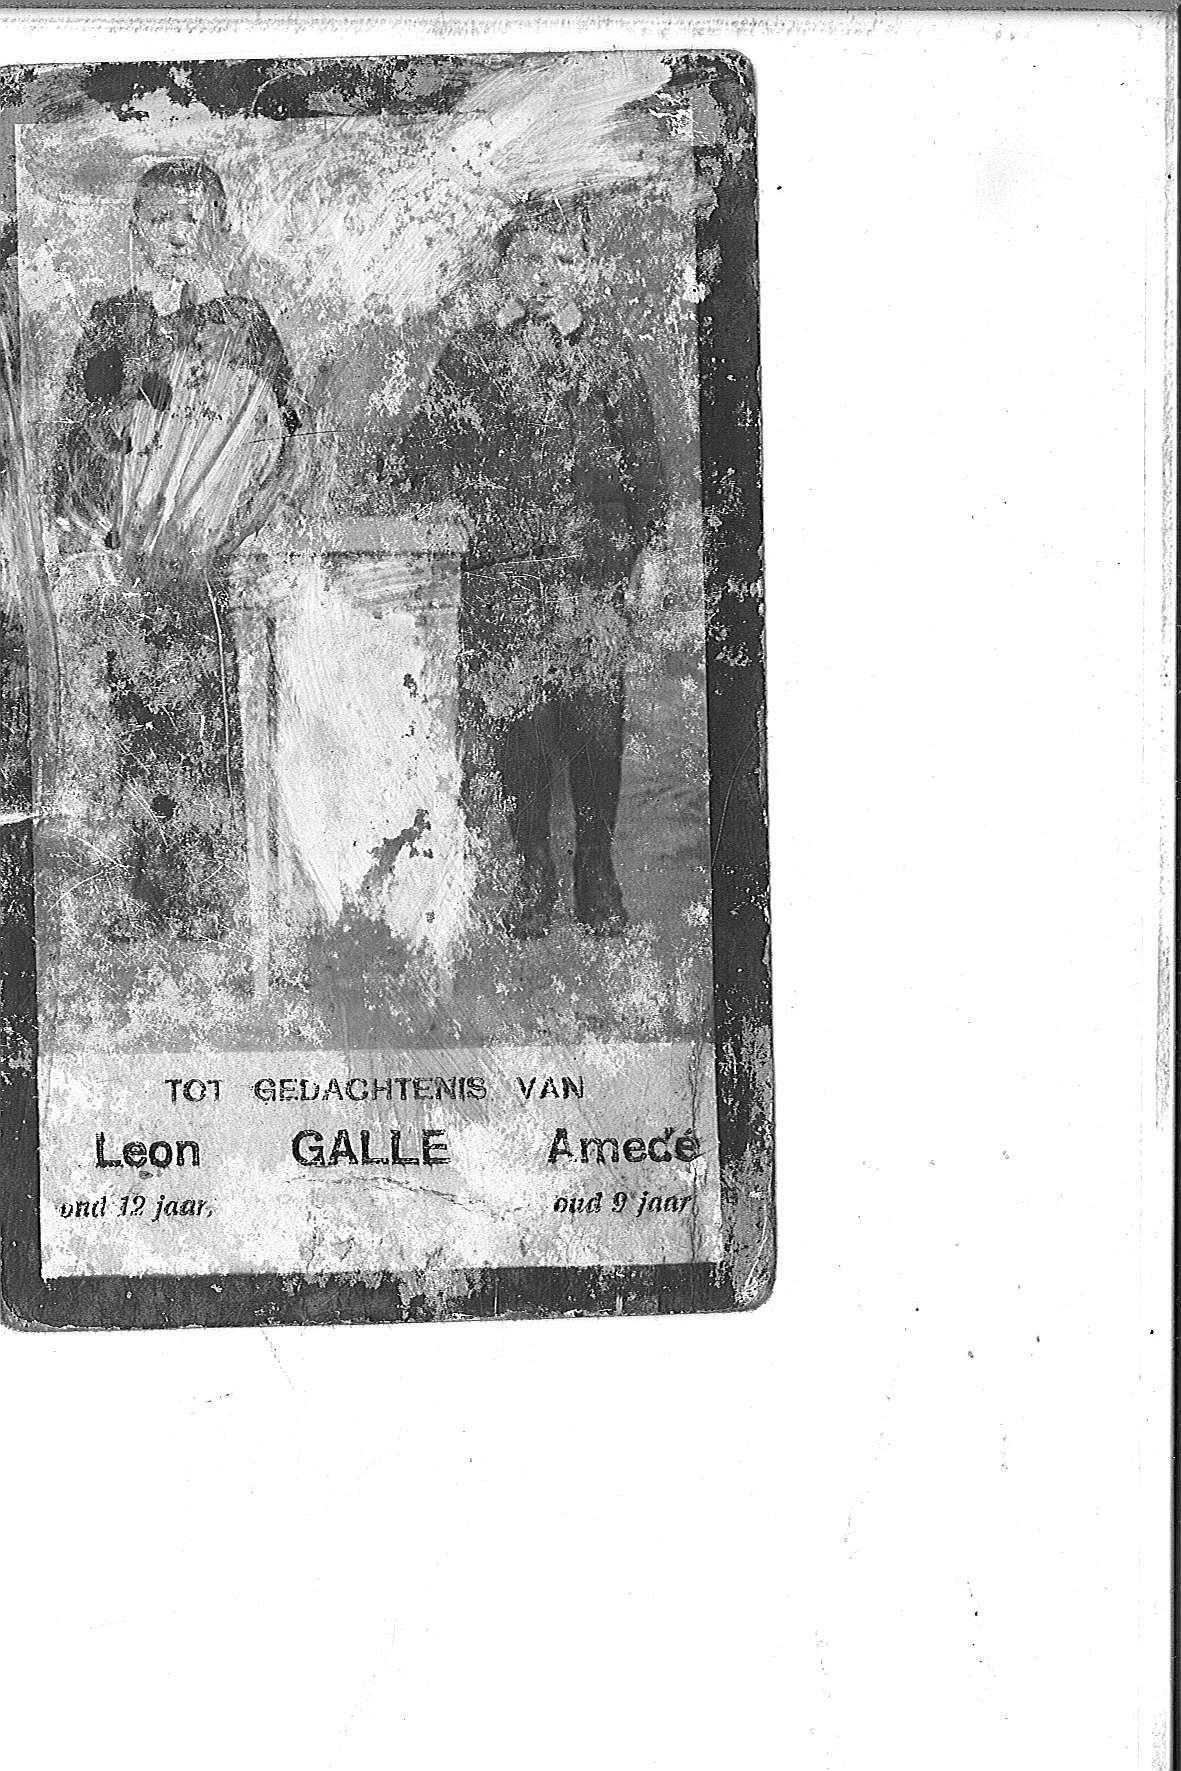 Leon en Amedéé (1918)20130212154520_00002.jpg